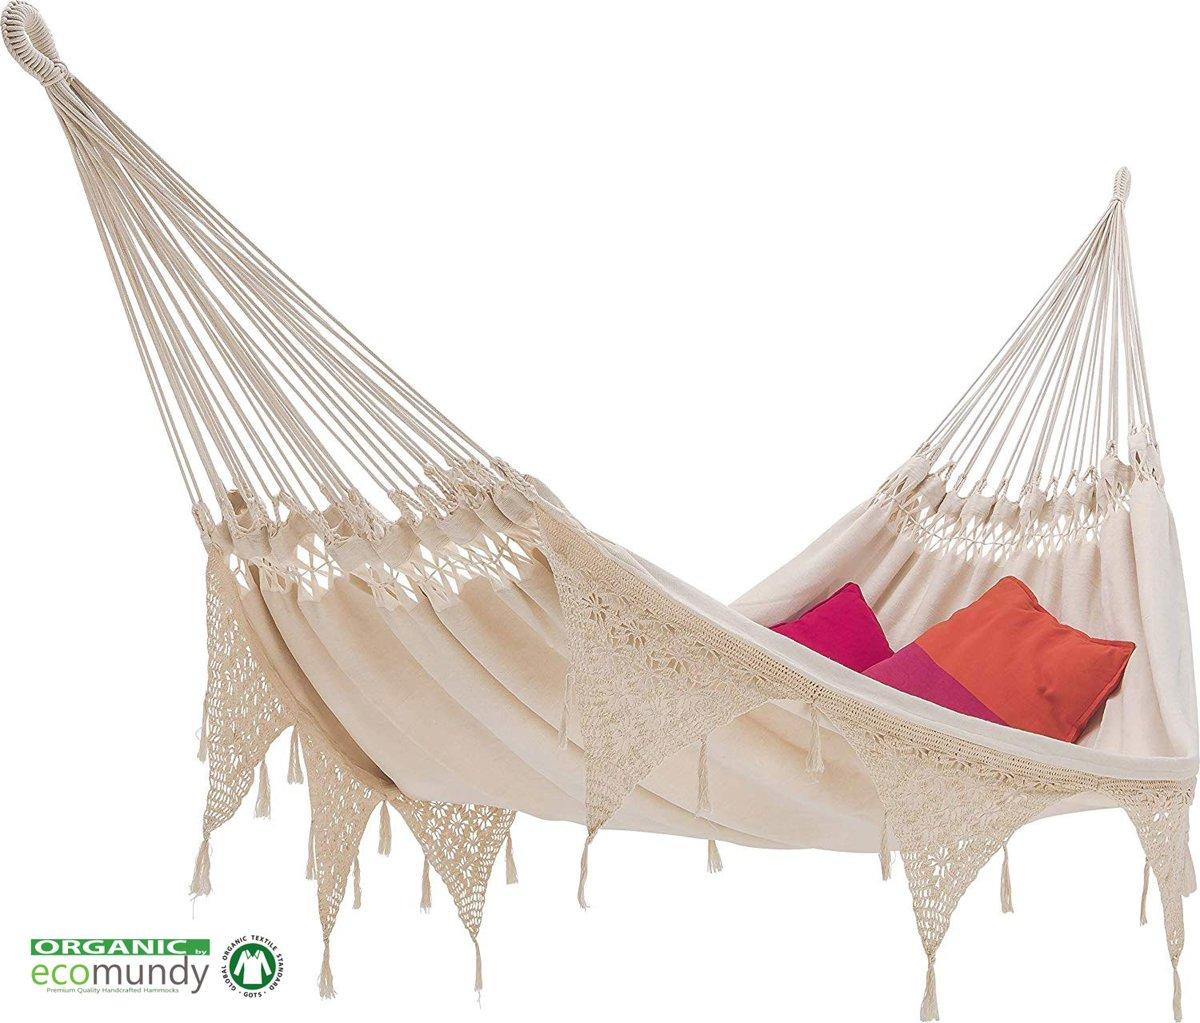 Ecomundy Ibiza XL- Luxe boho stijl hangmat met franje - Biologisch katoen GOTS - 160x240x380cm